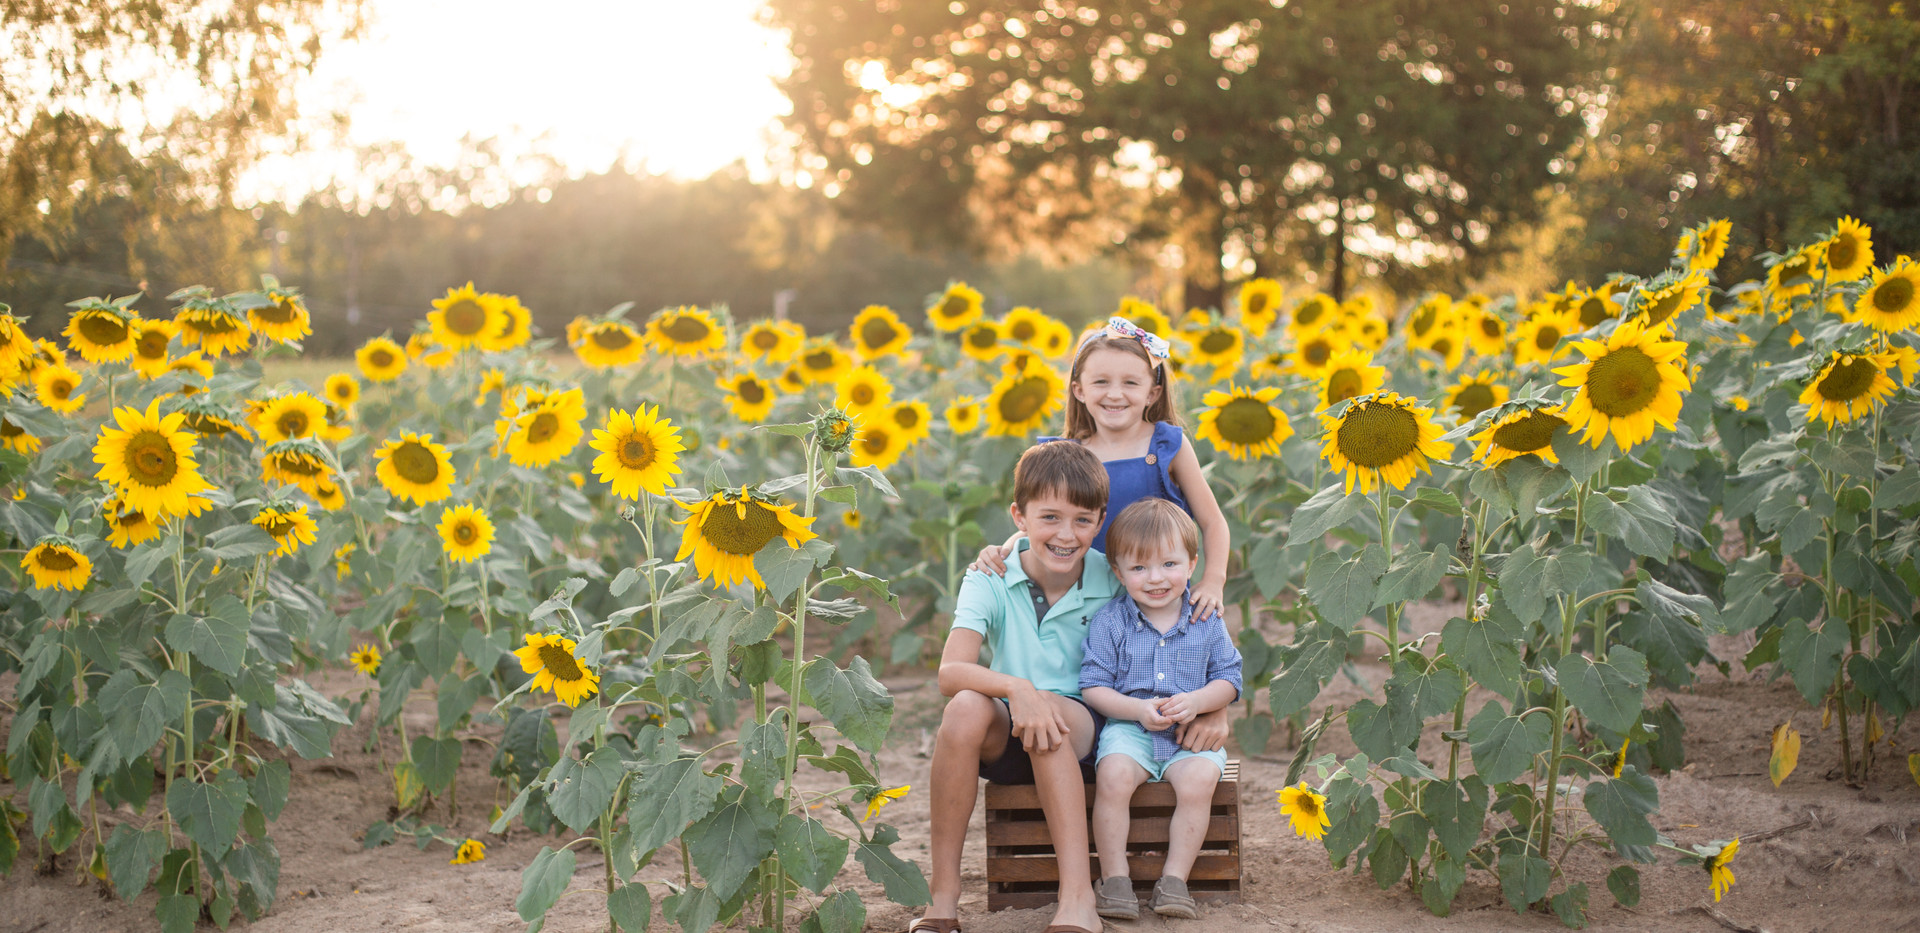 Chattanooga sunflower photos, photographer Chattanooga